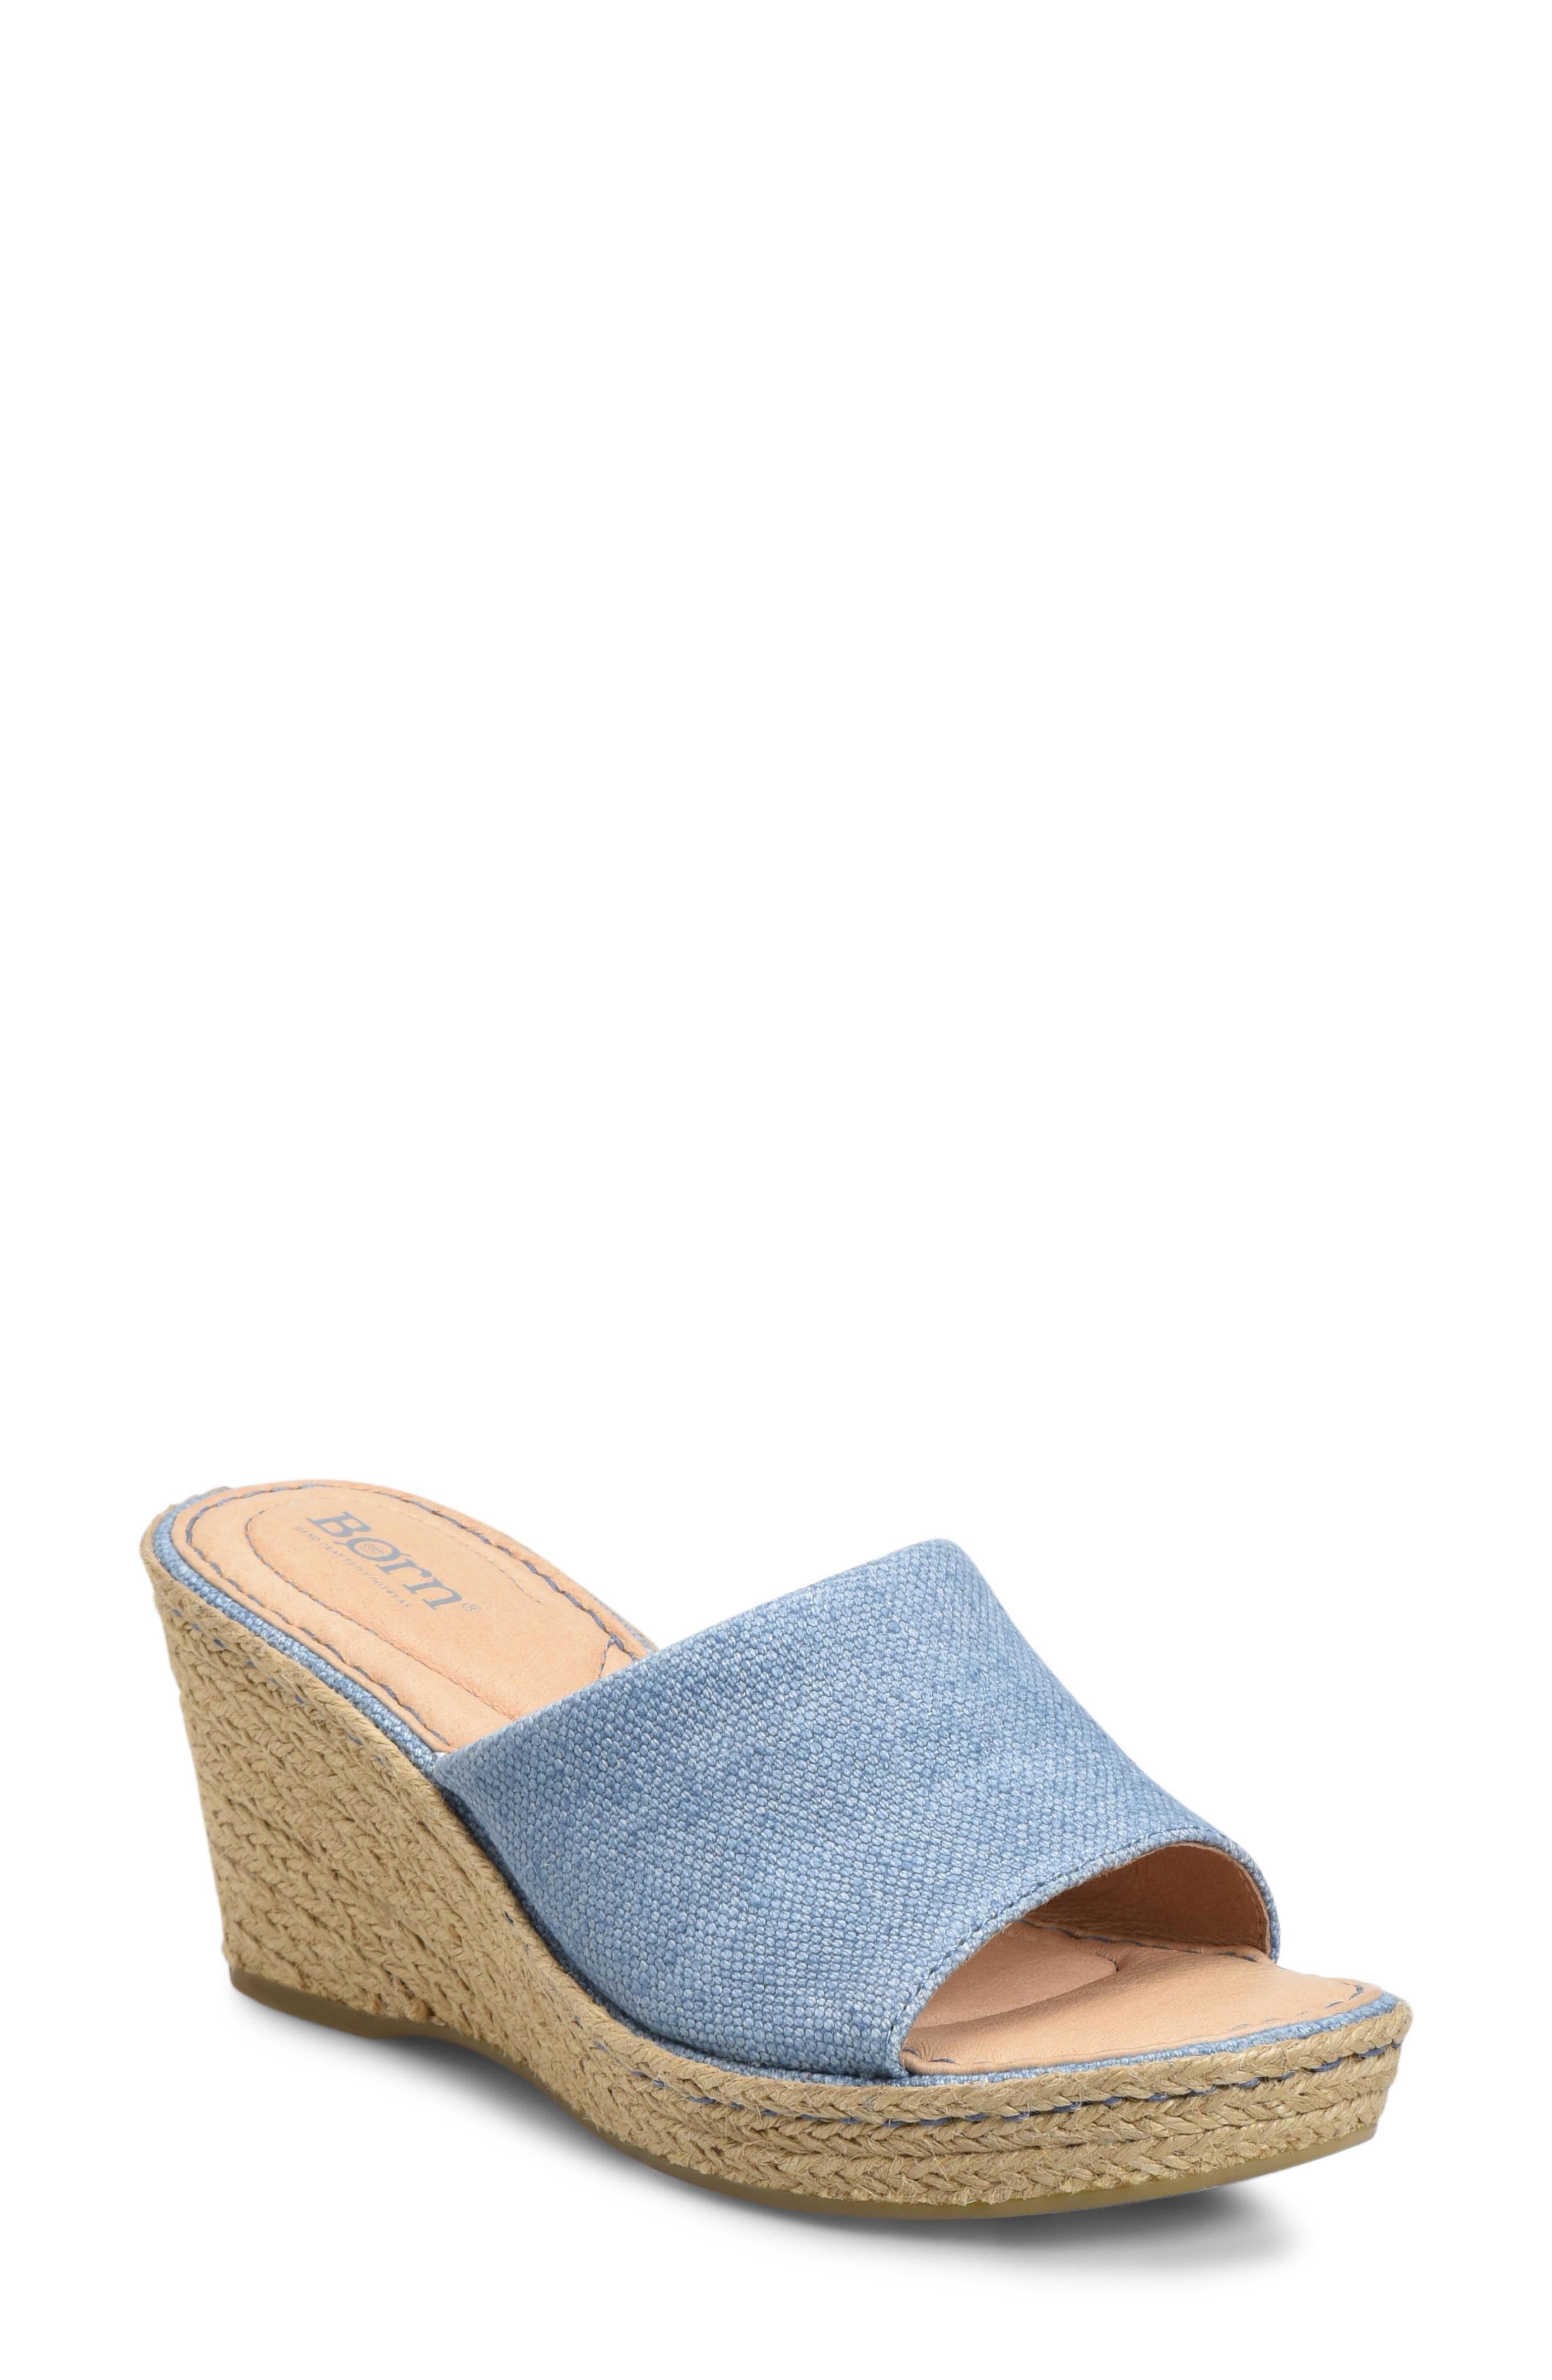 14d7b892c29 Lyst - Born Missoula (black Fabric) Women s Wedge Shoes in Blue ...